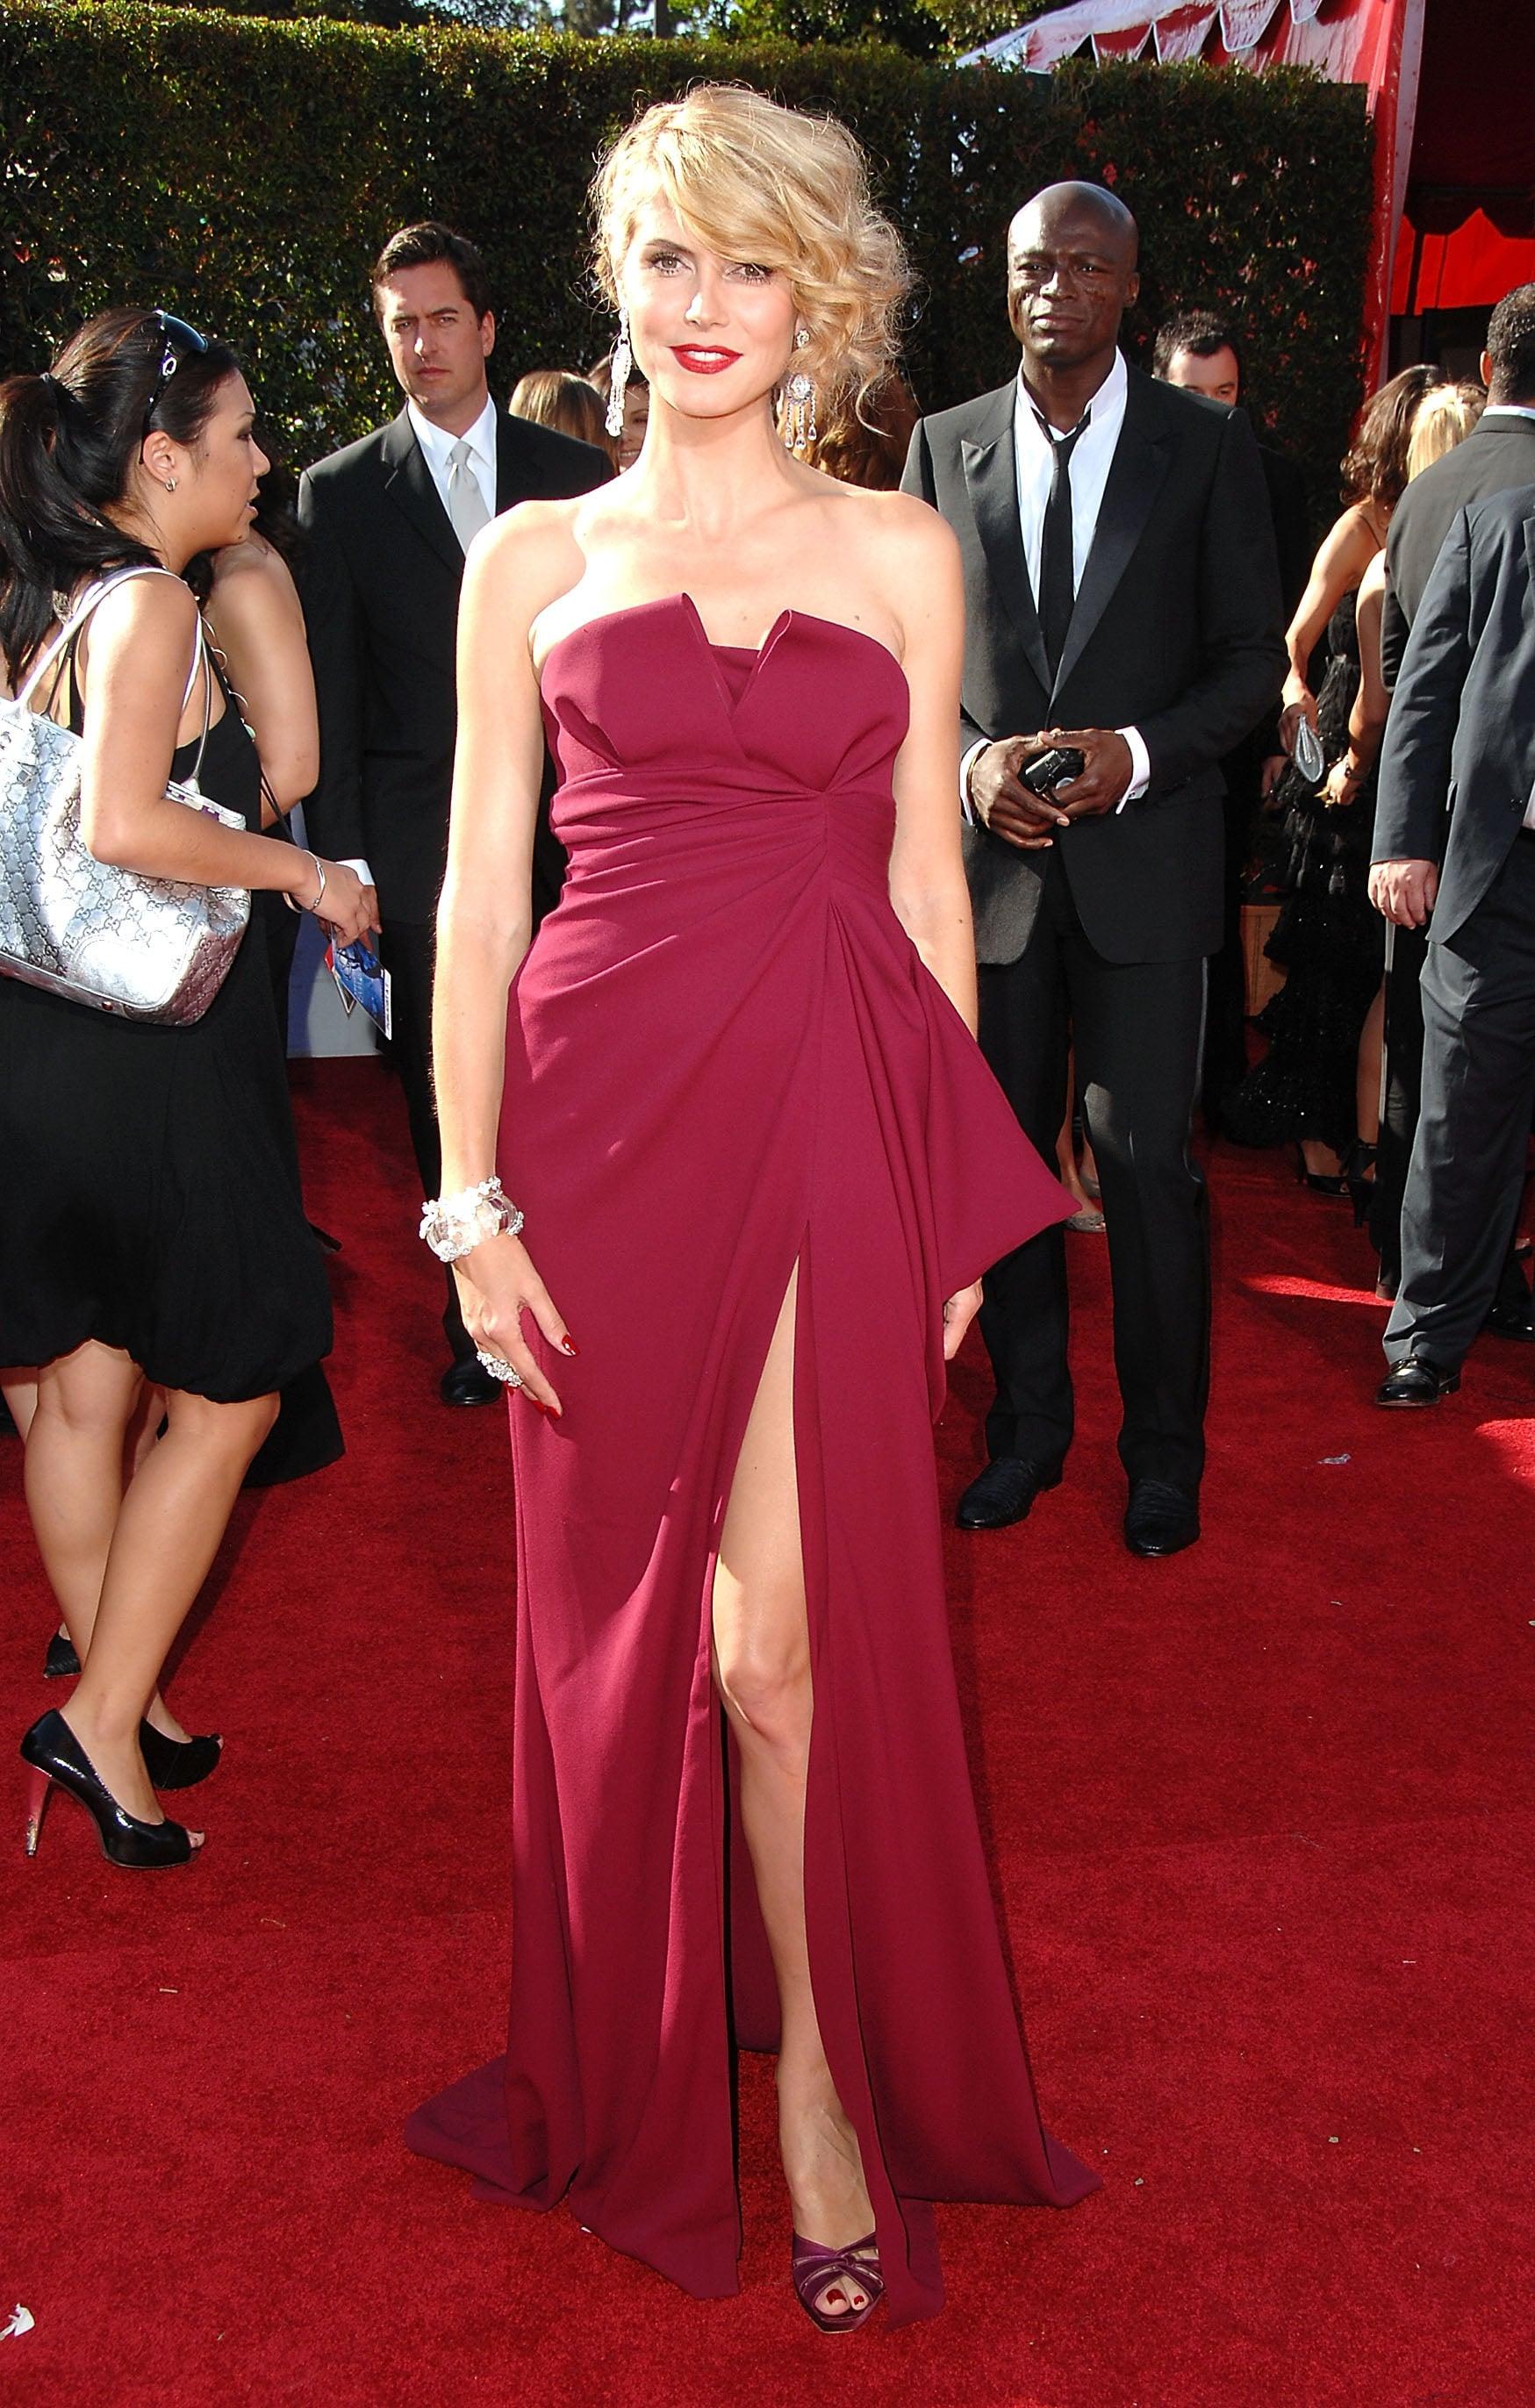 Heidi Klum in Christian Dior at the 2007 Emmy Awards